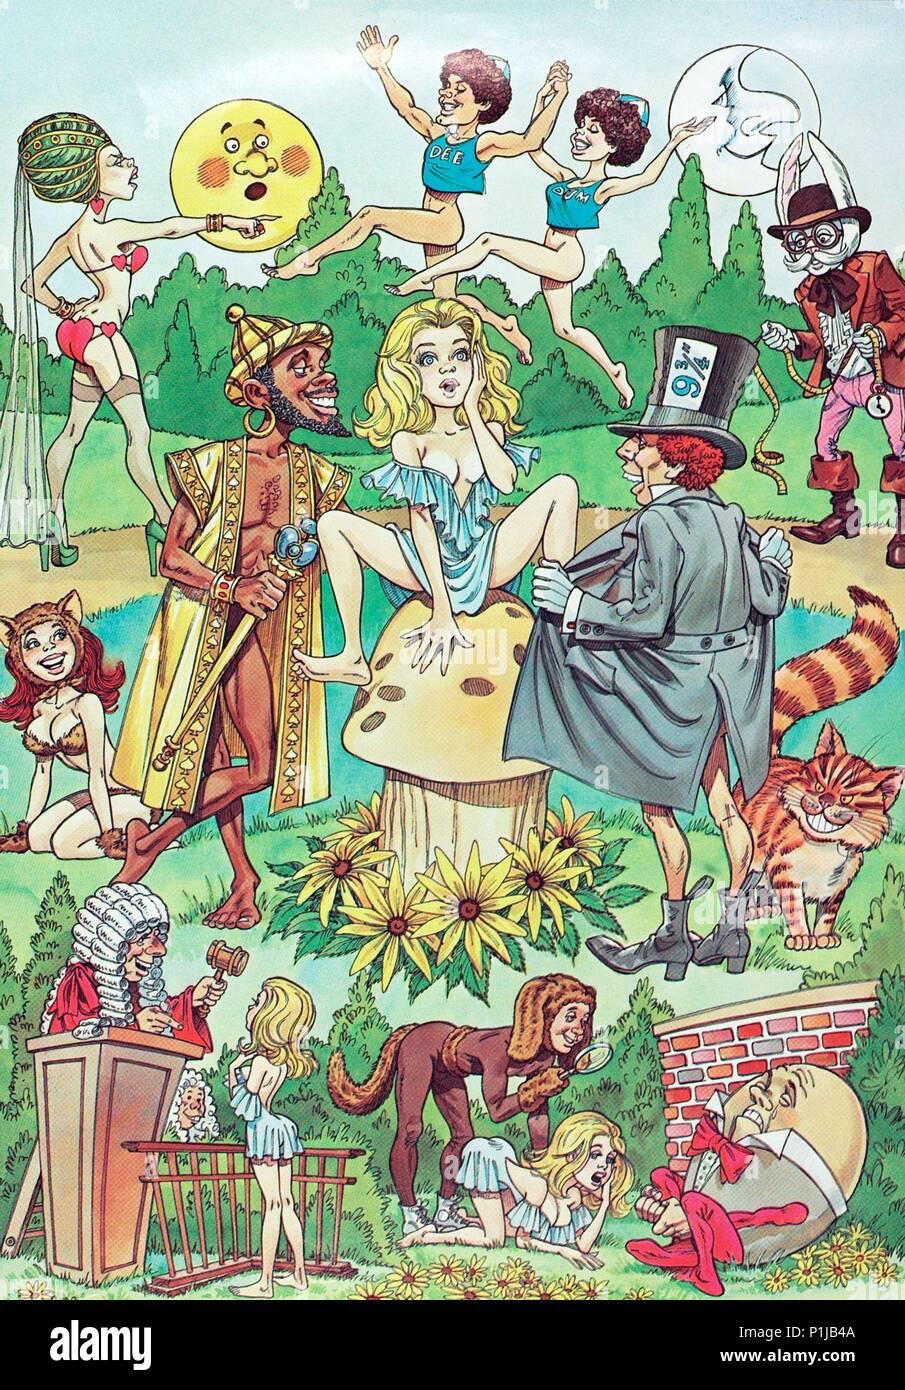 Alice In Wonderland 1976